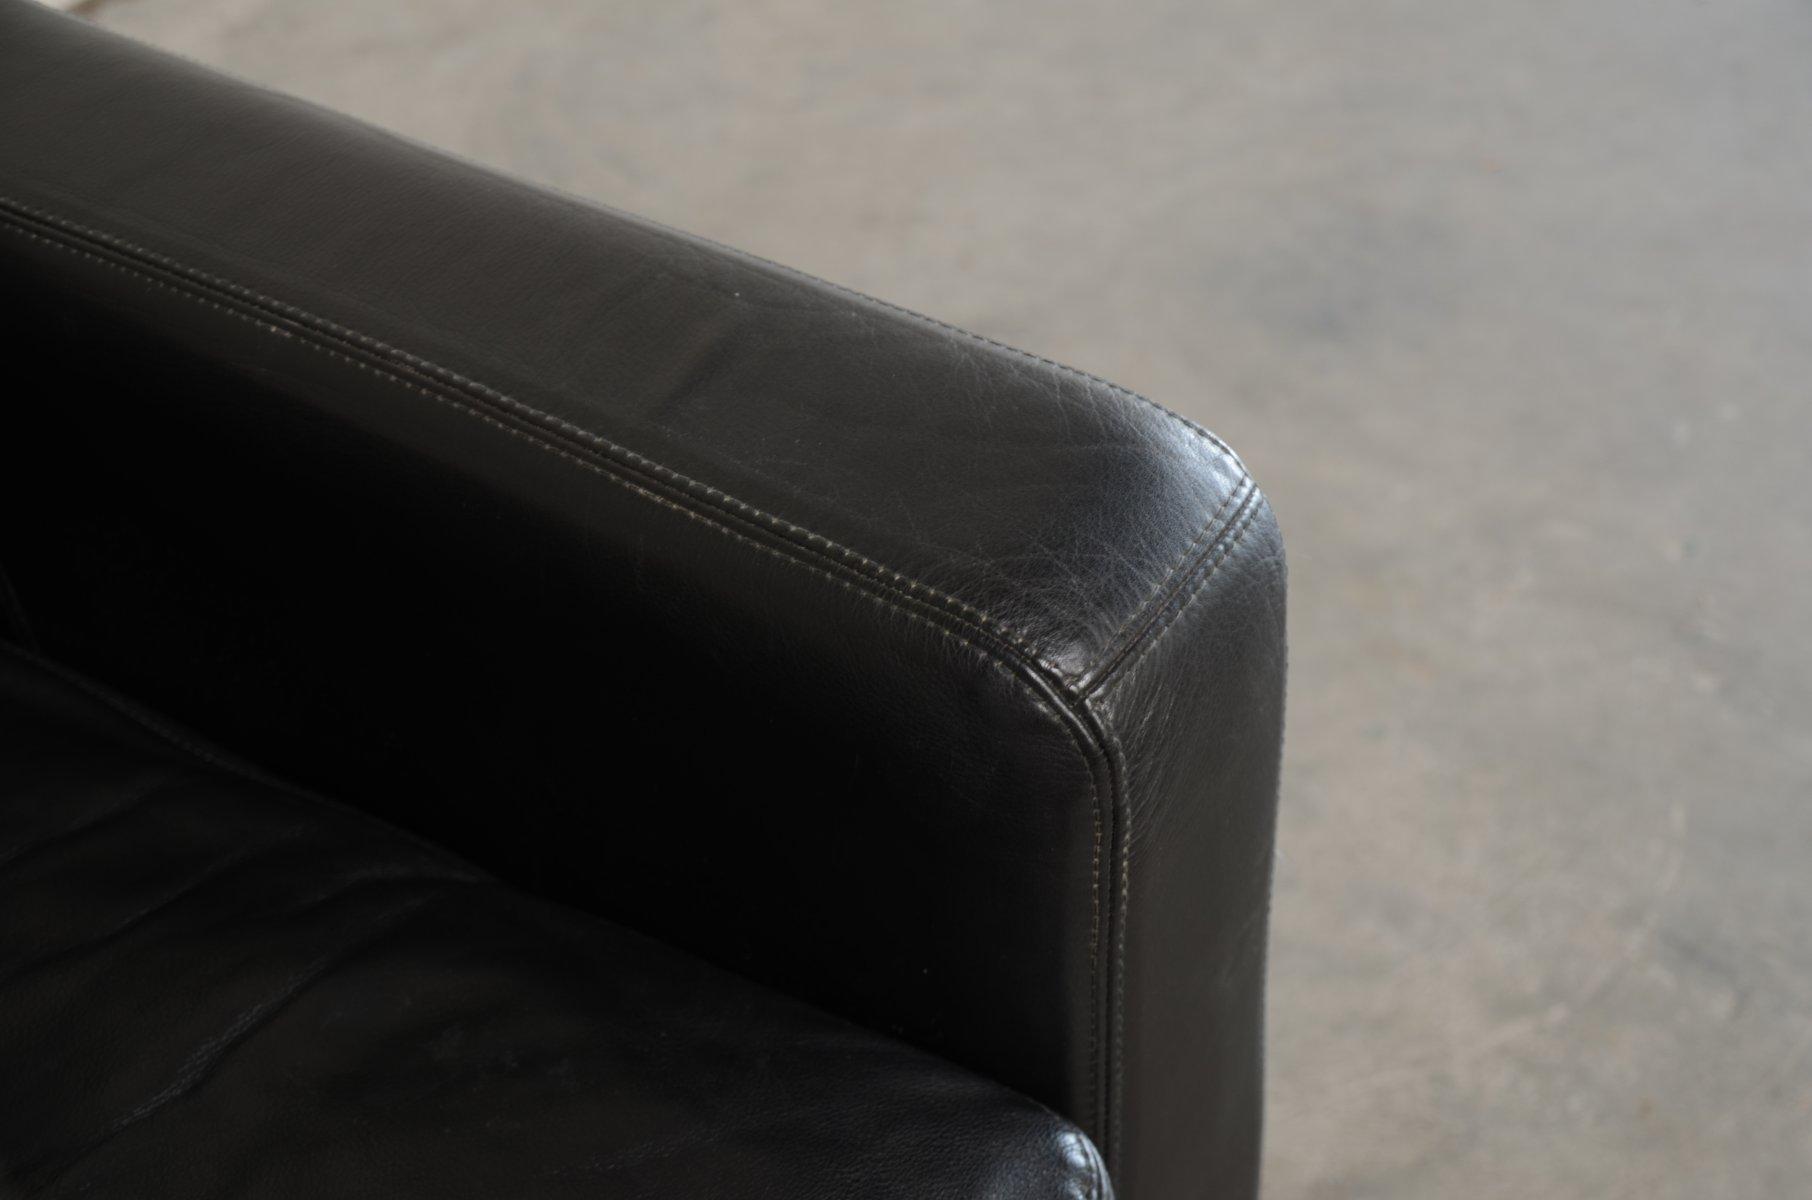 Vintage conseta ledersofa in schwarz von cor bei pamono kaufen for Ledersofa schwarz